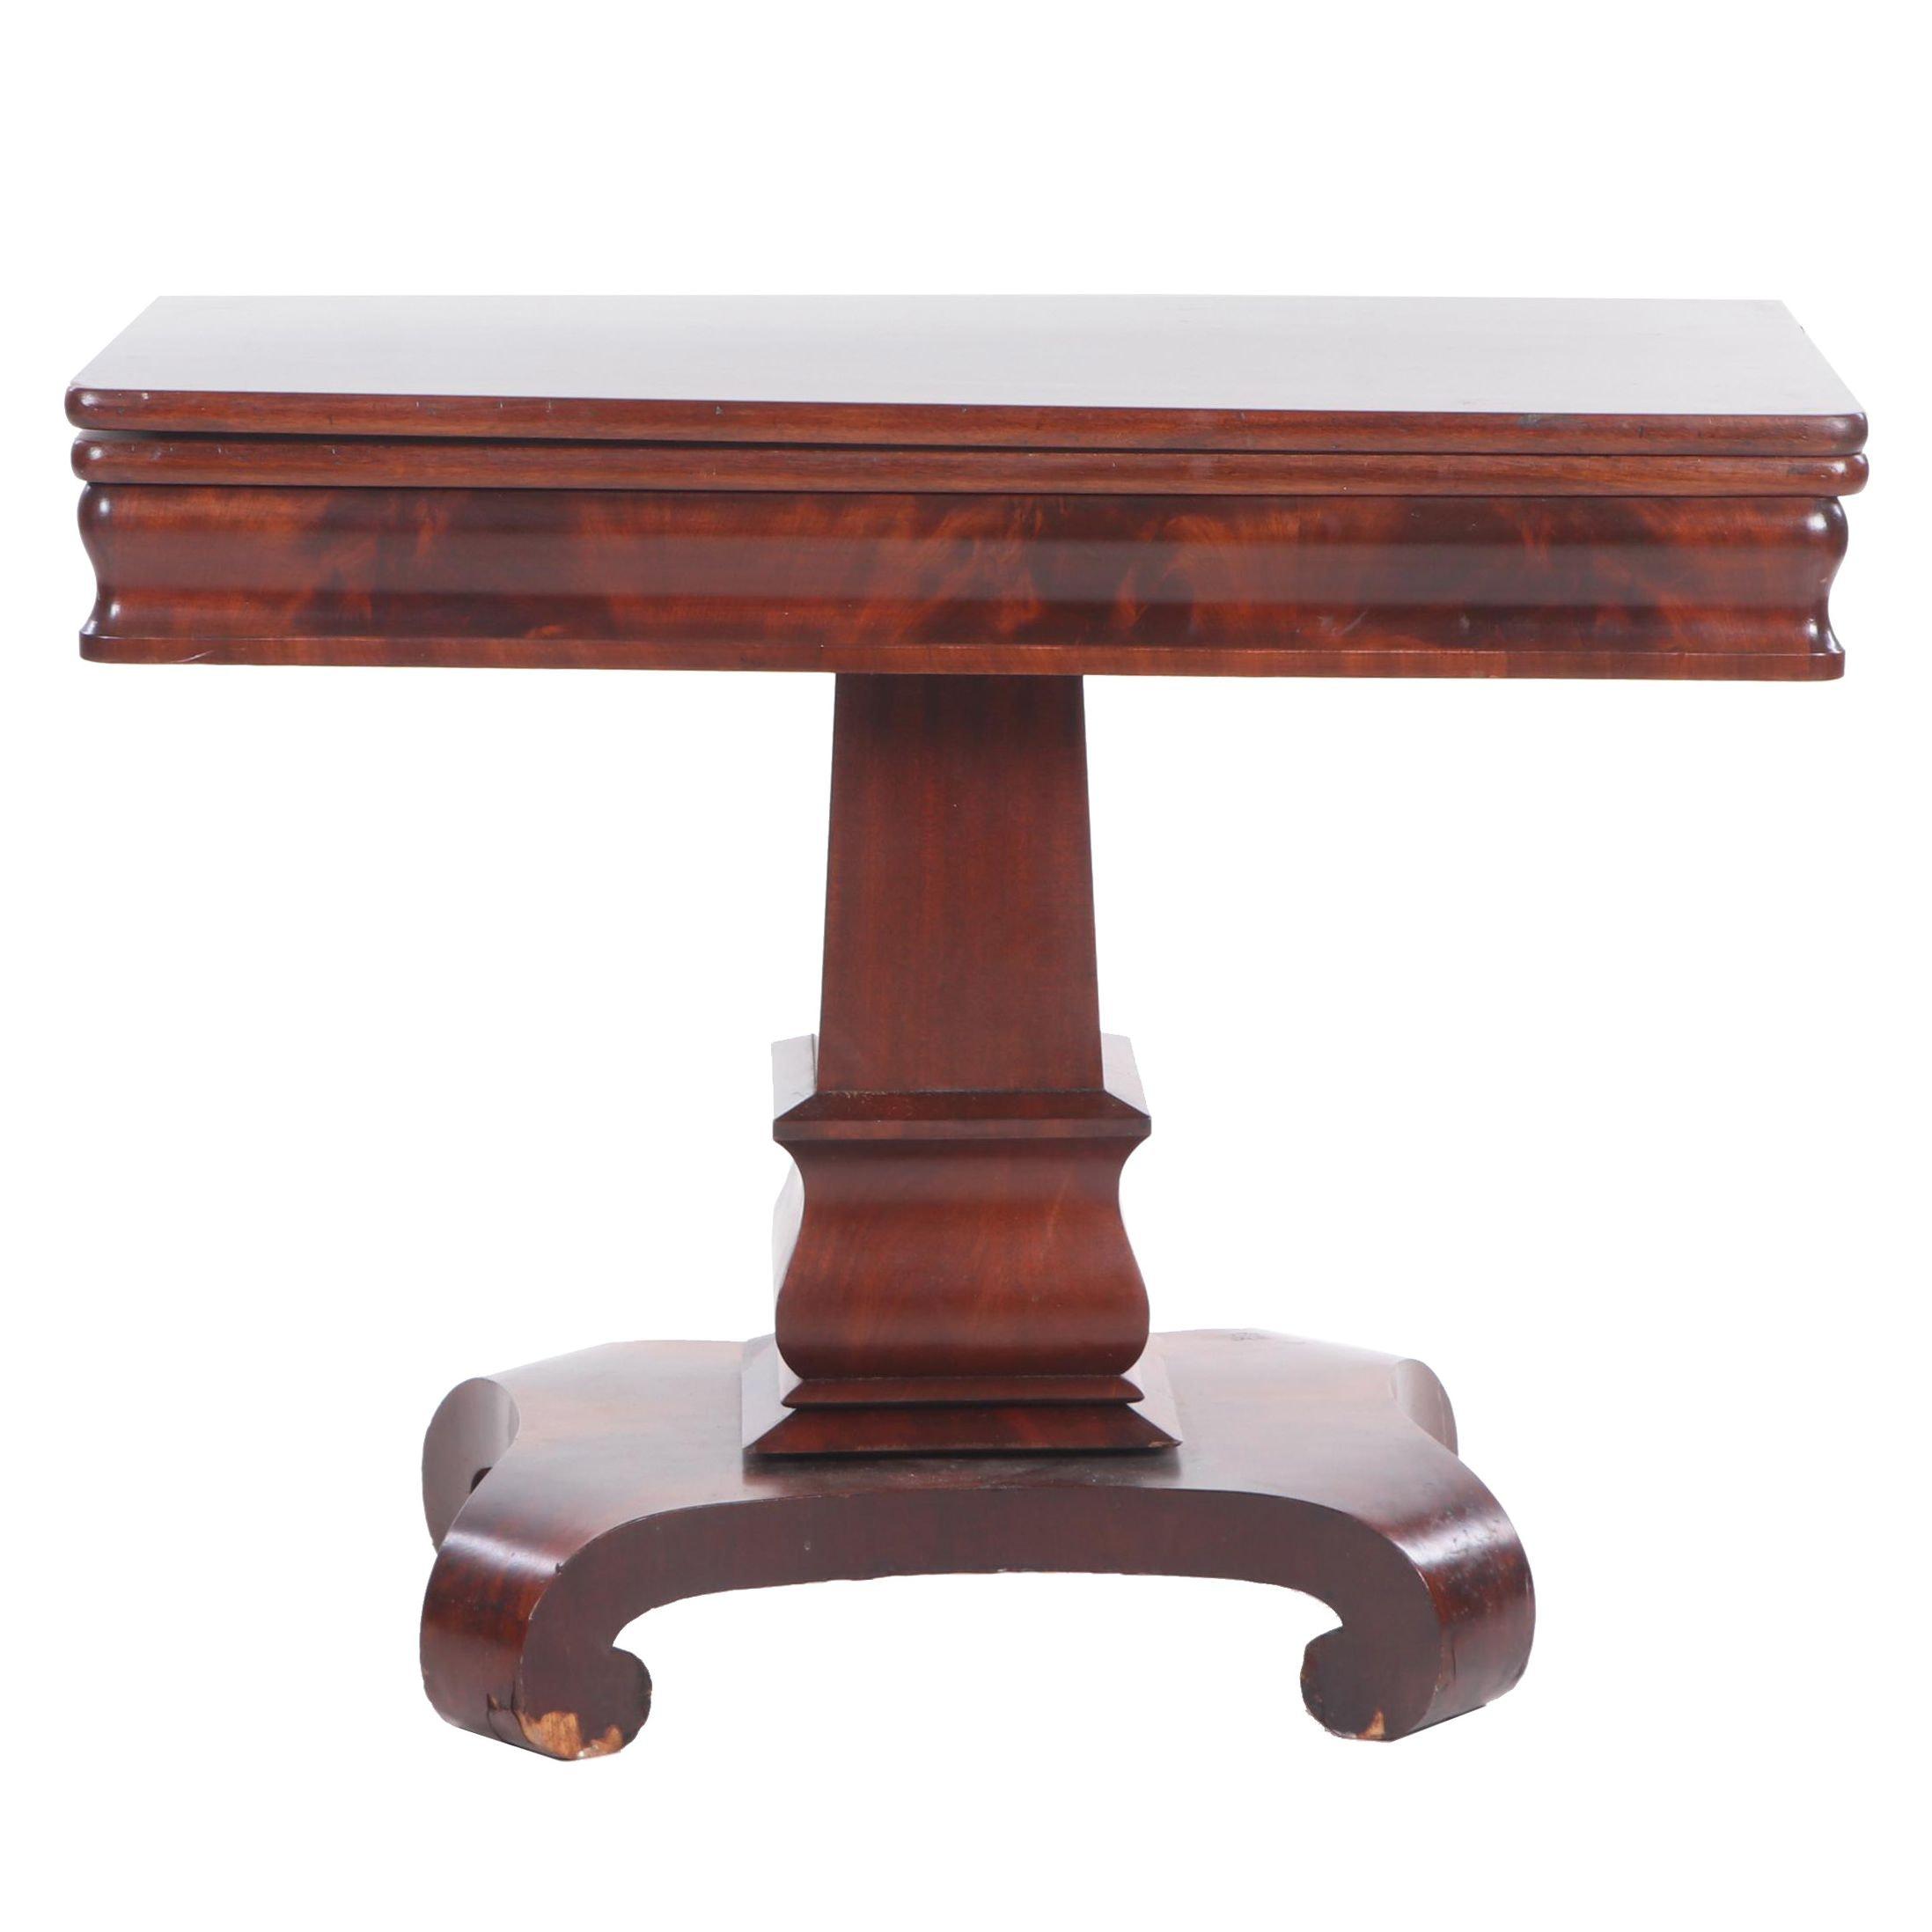 Empire Mahogany Games Table, Mid to Late 19th Century